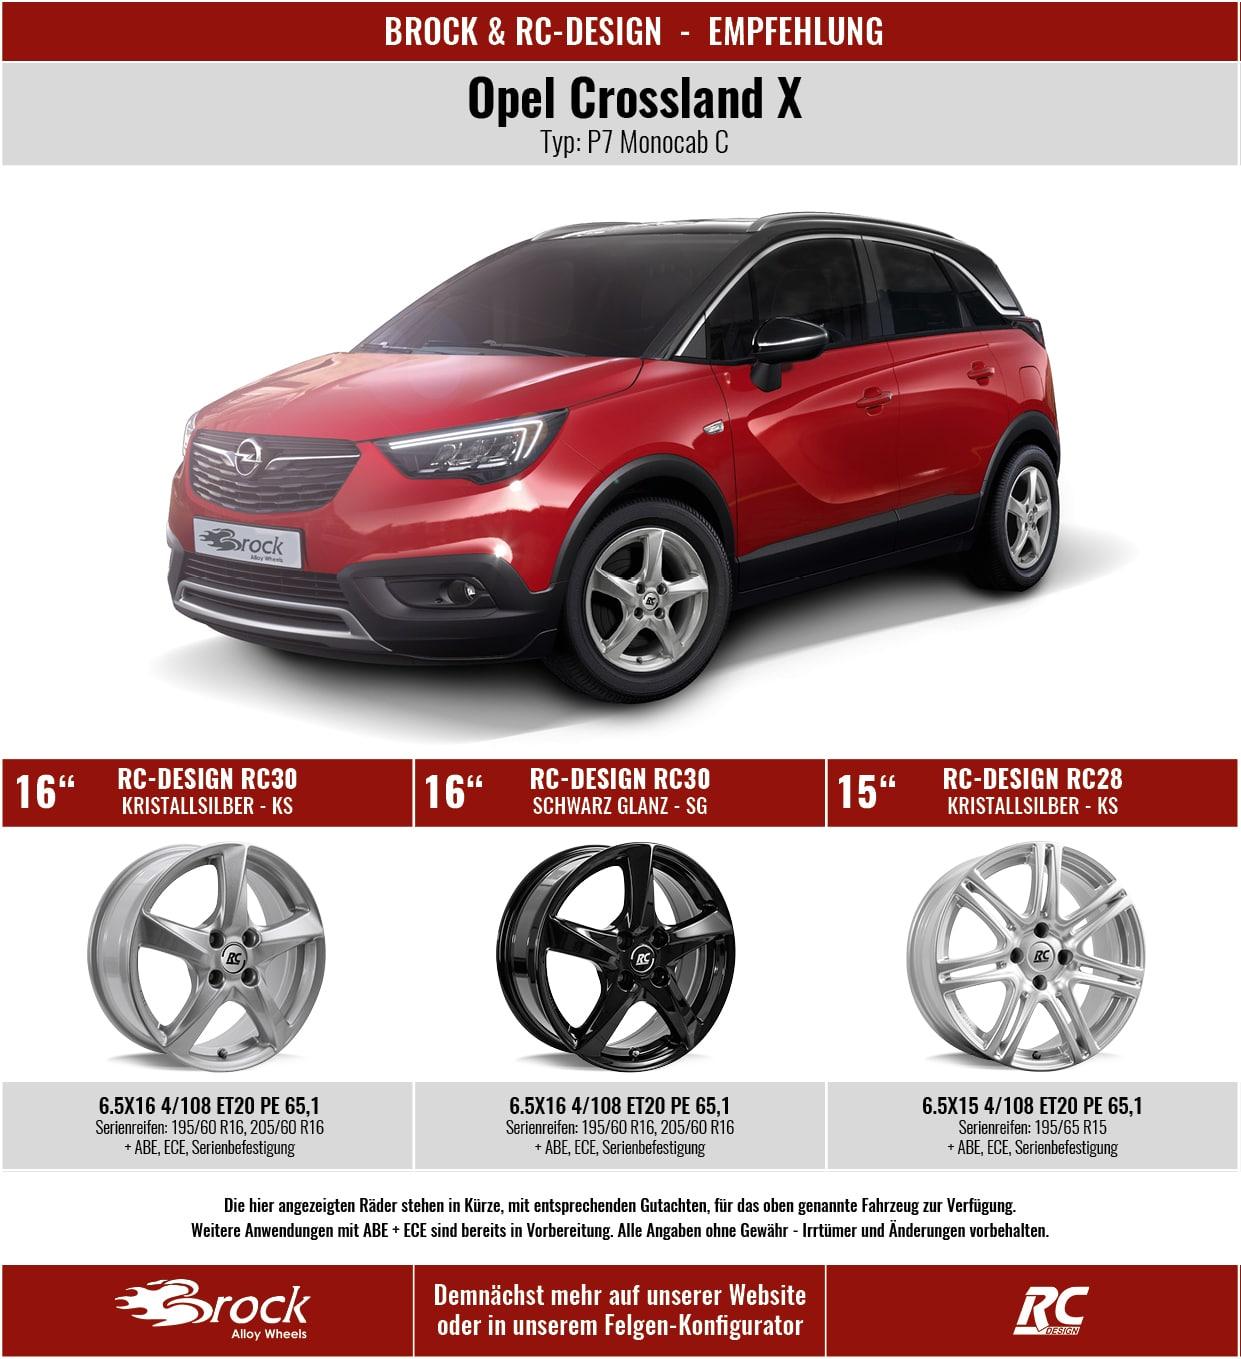 Empfehlung Opel Crossland X